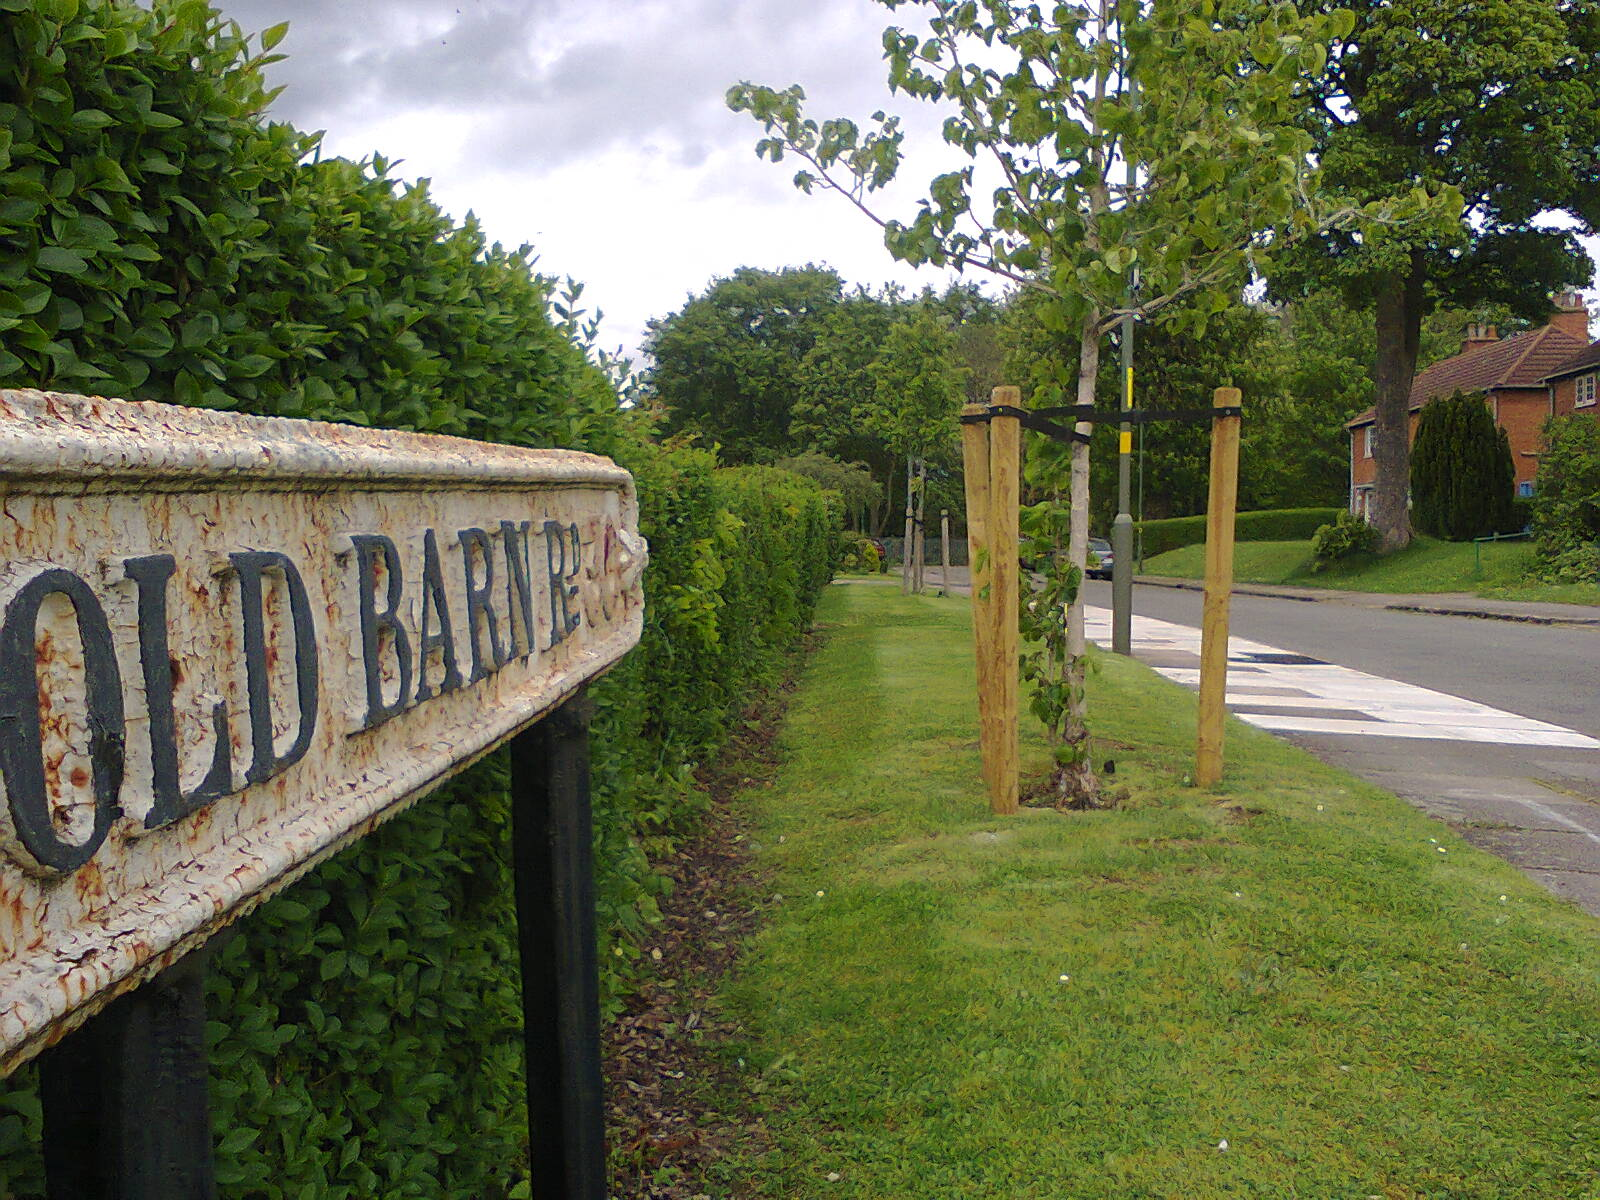 Old Barn Road